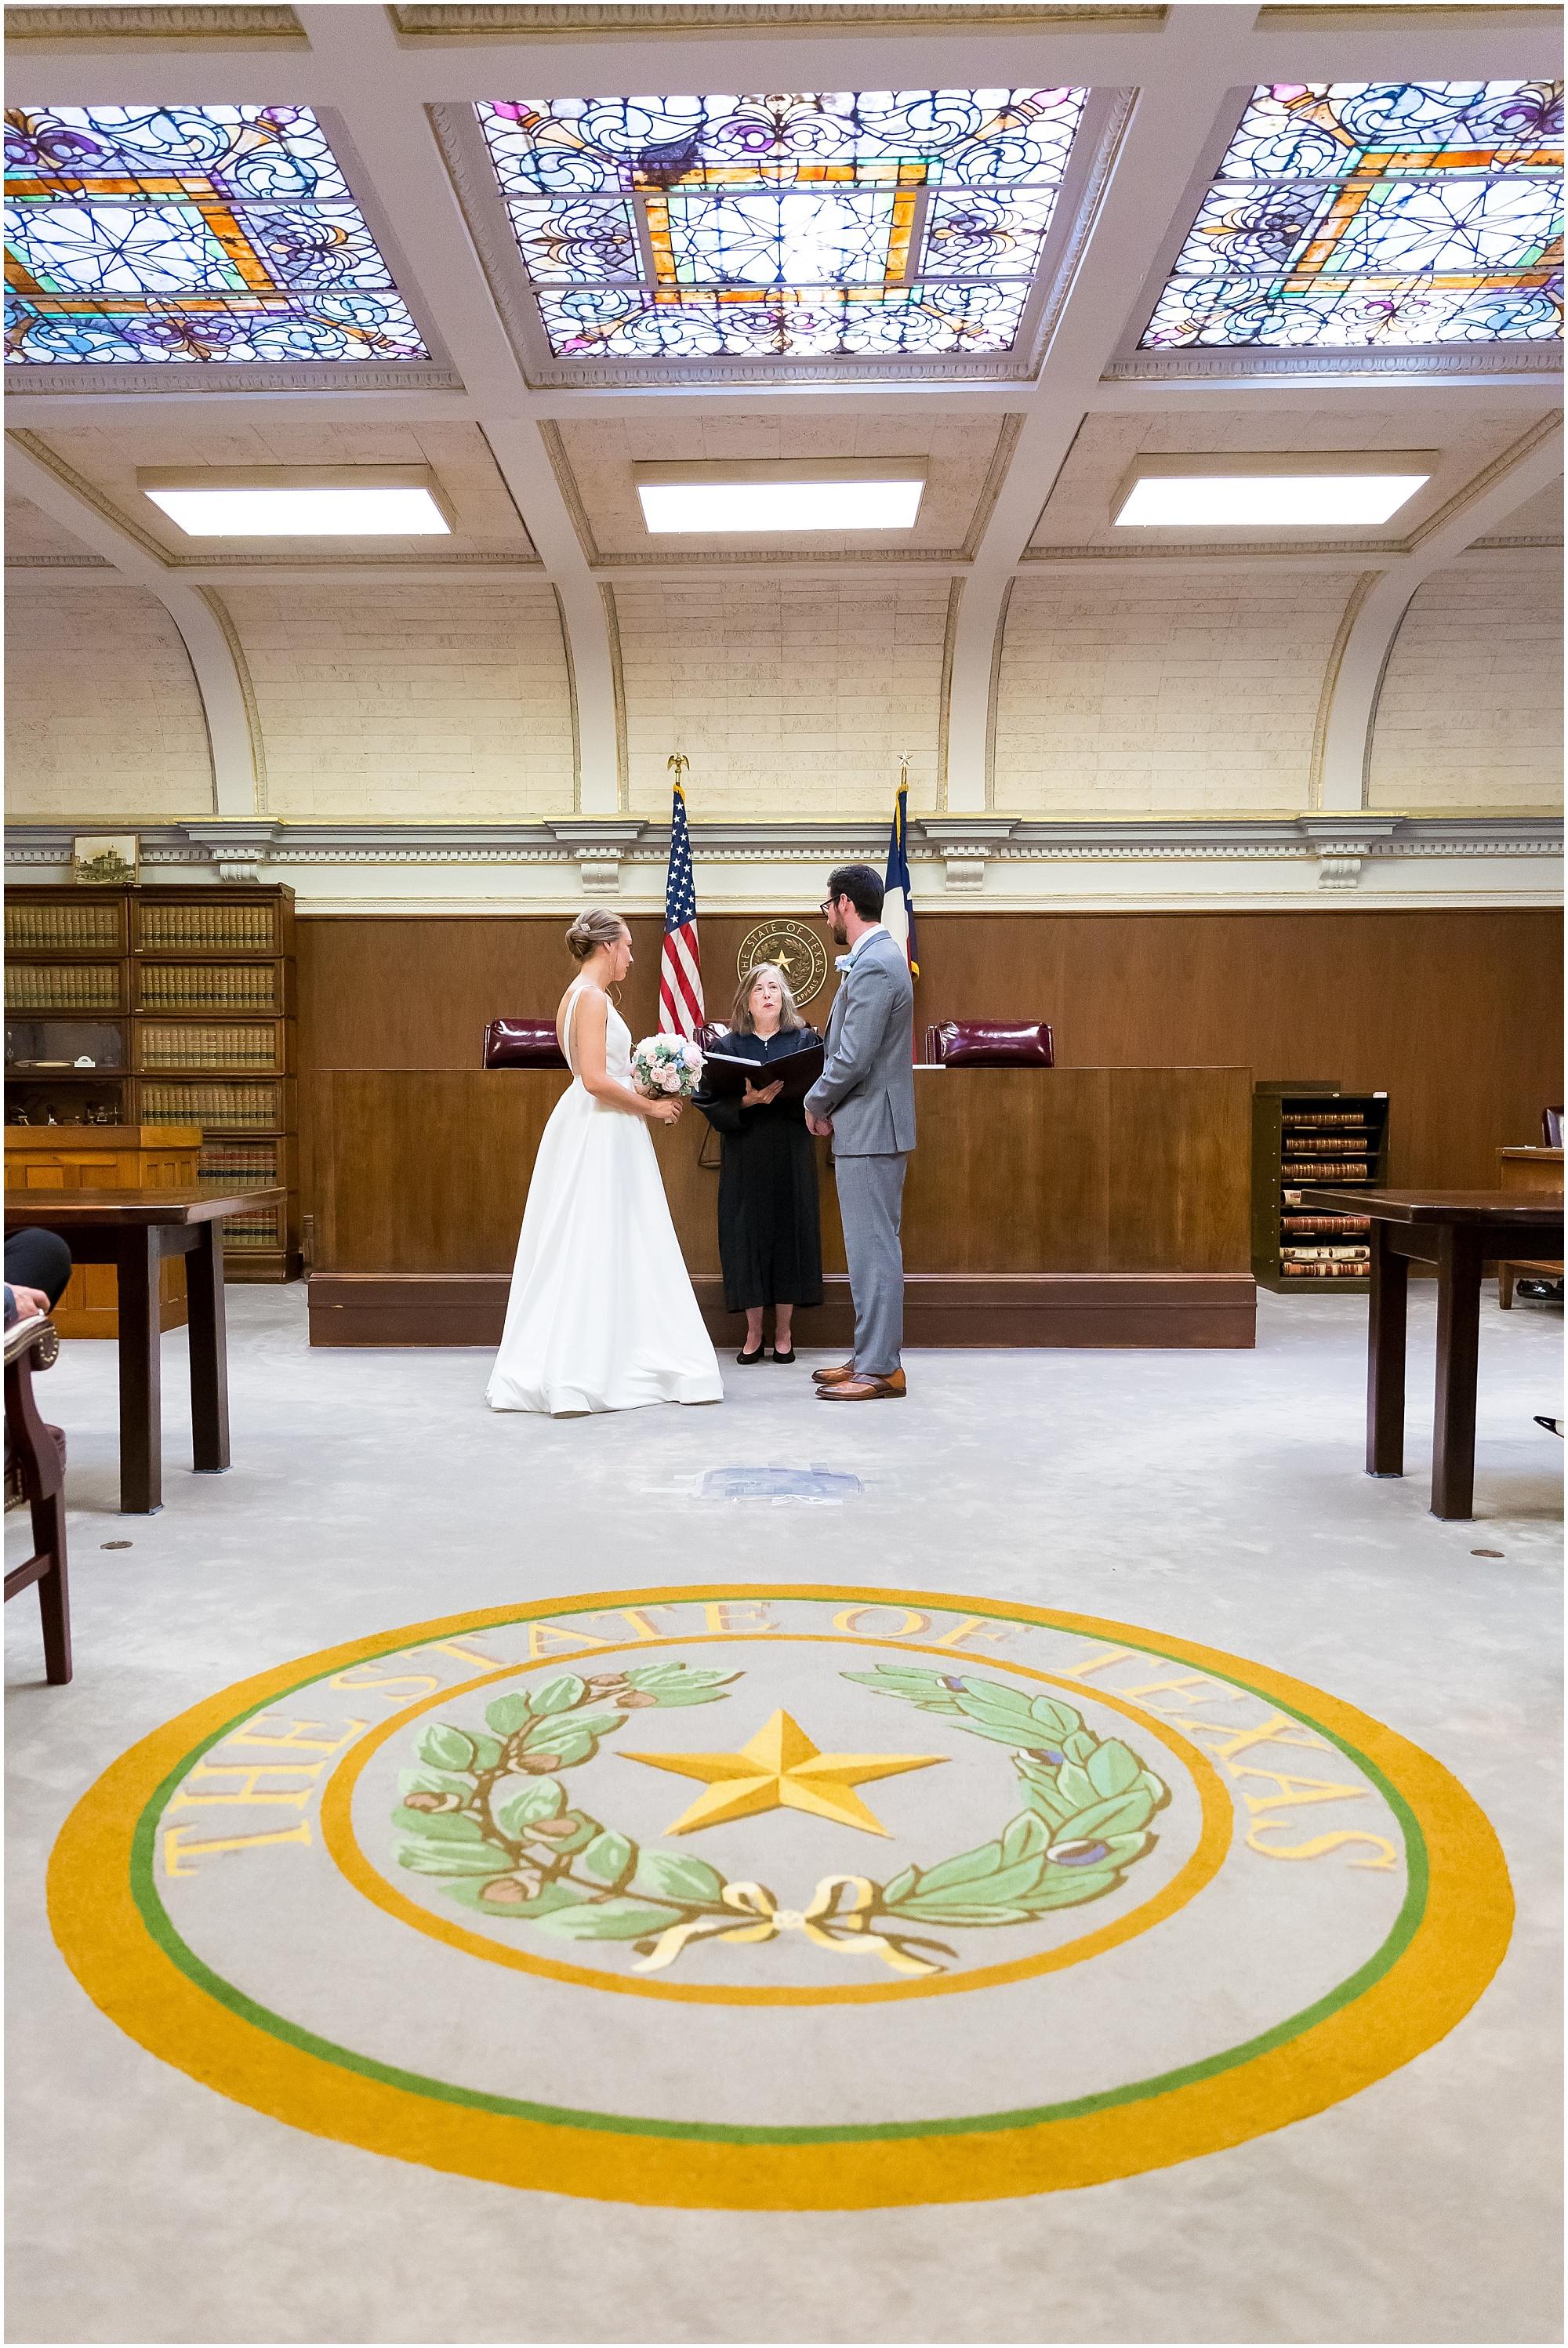 Courthouse-Wedding-Waco-Texas_0012.jpg